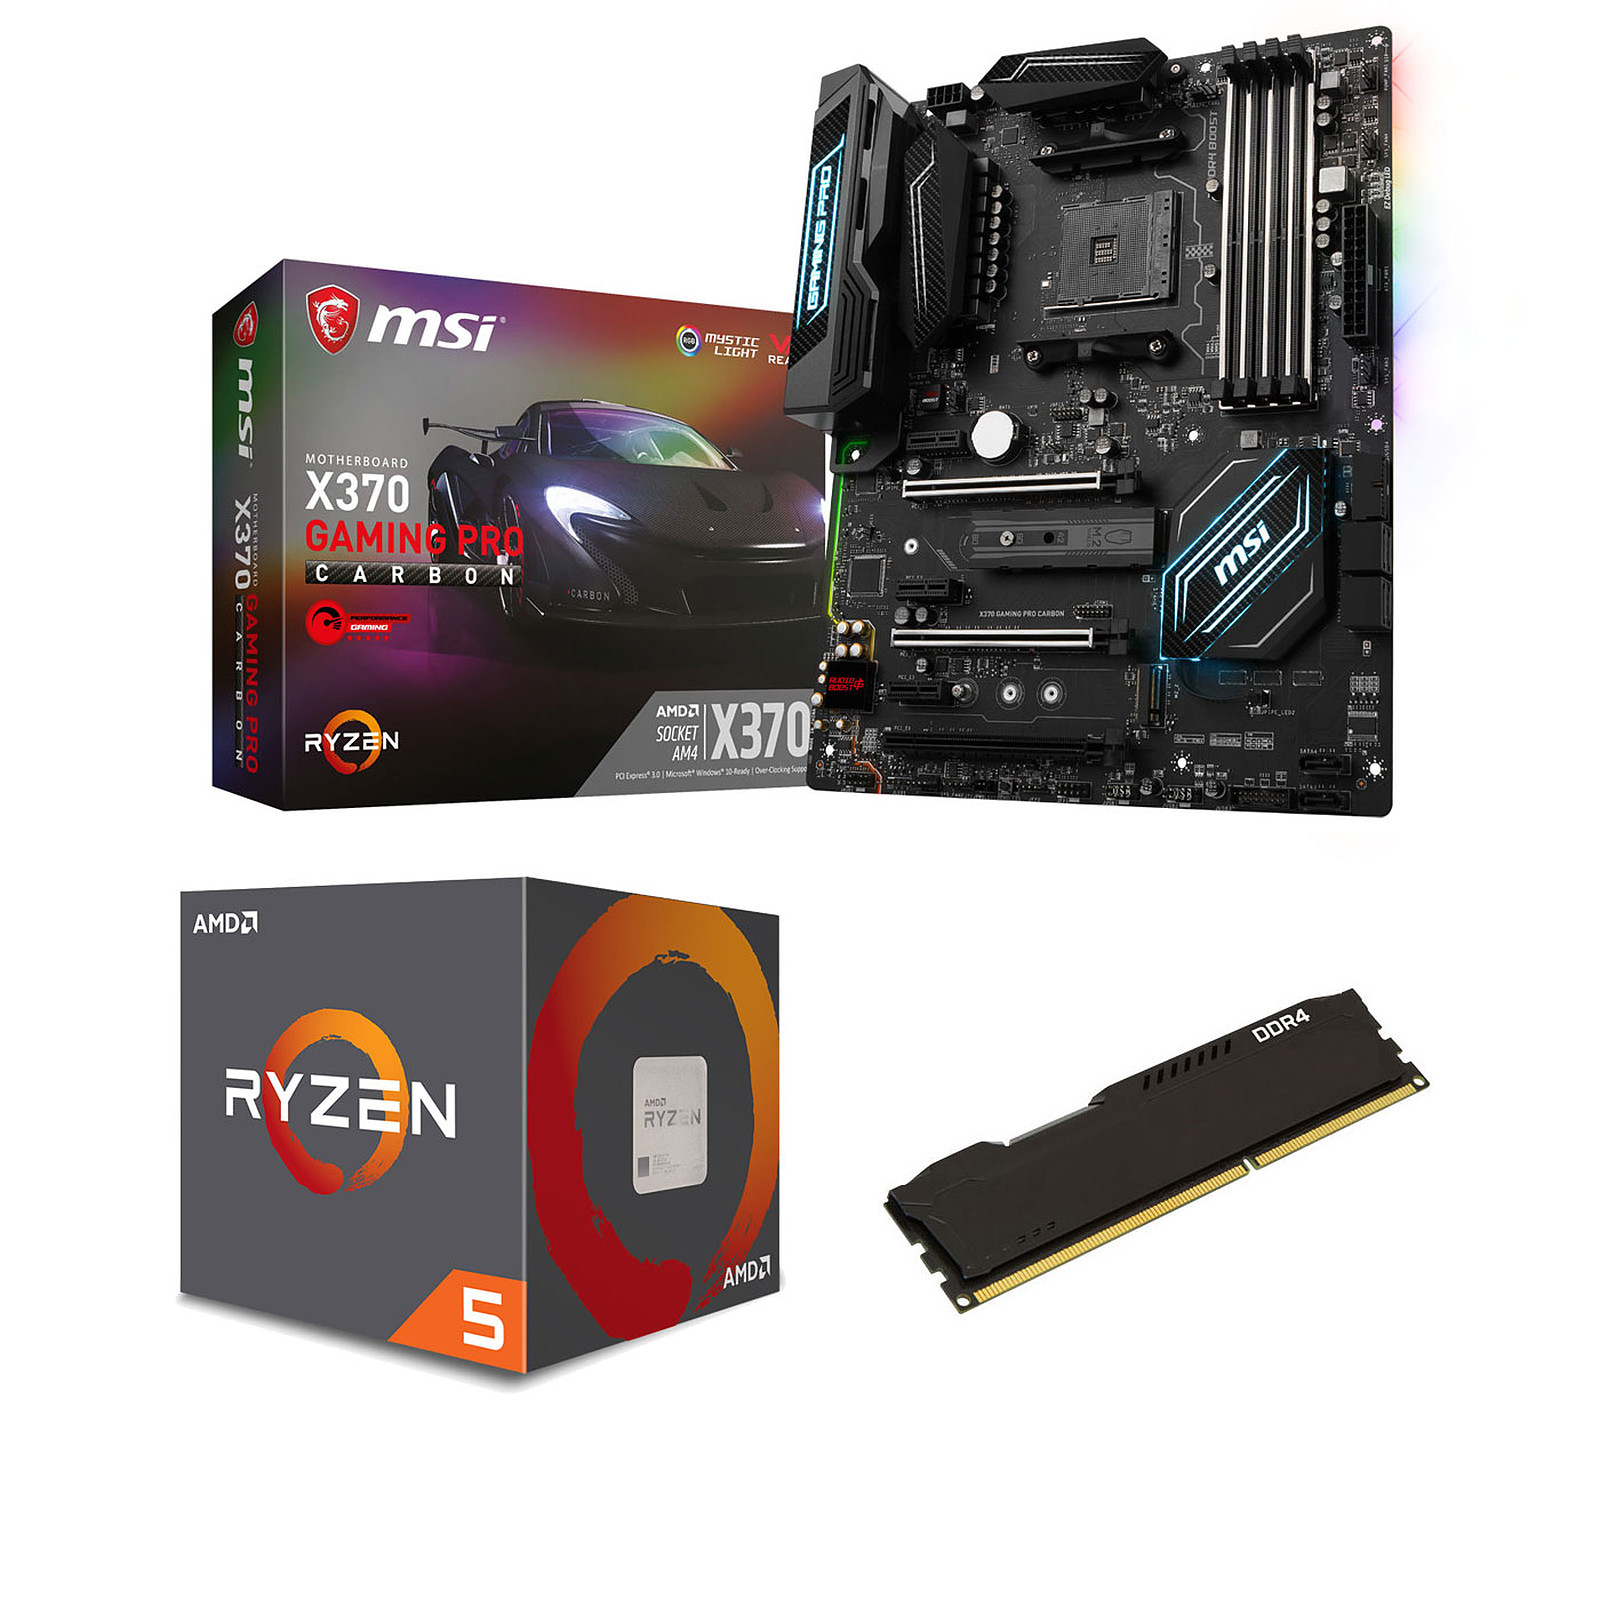 Kit Upgrade PC AMD Ryzen 5 1600 MSI X370 GAMING PRO CARBON 8 Go